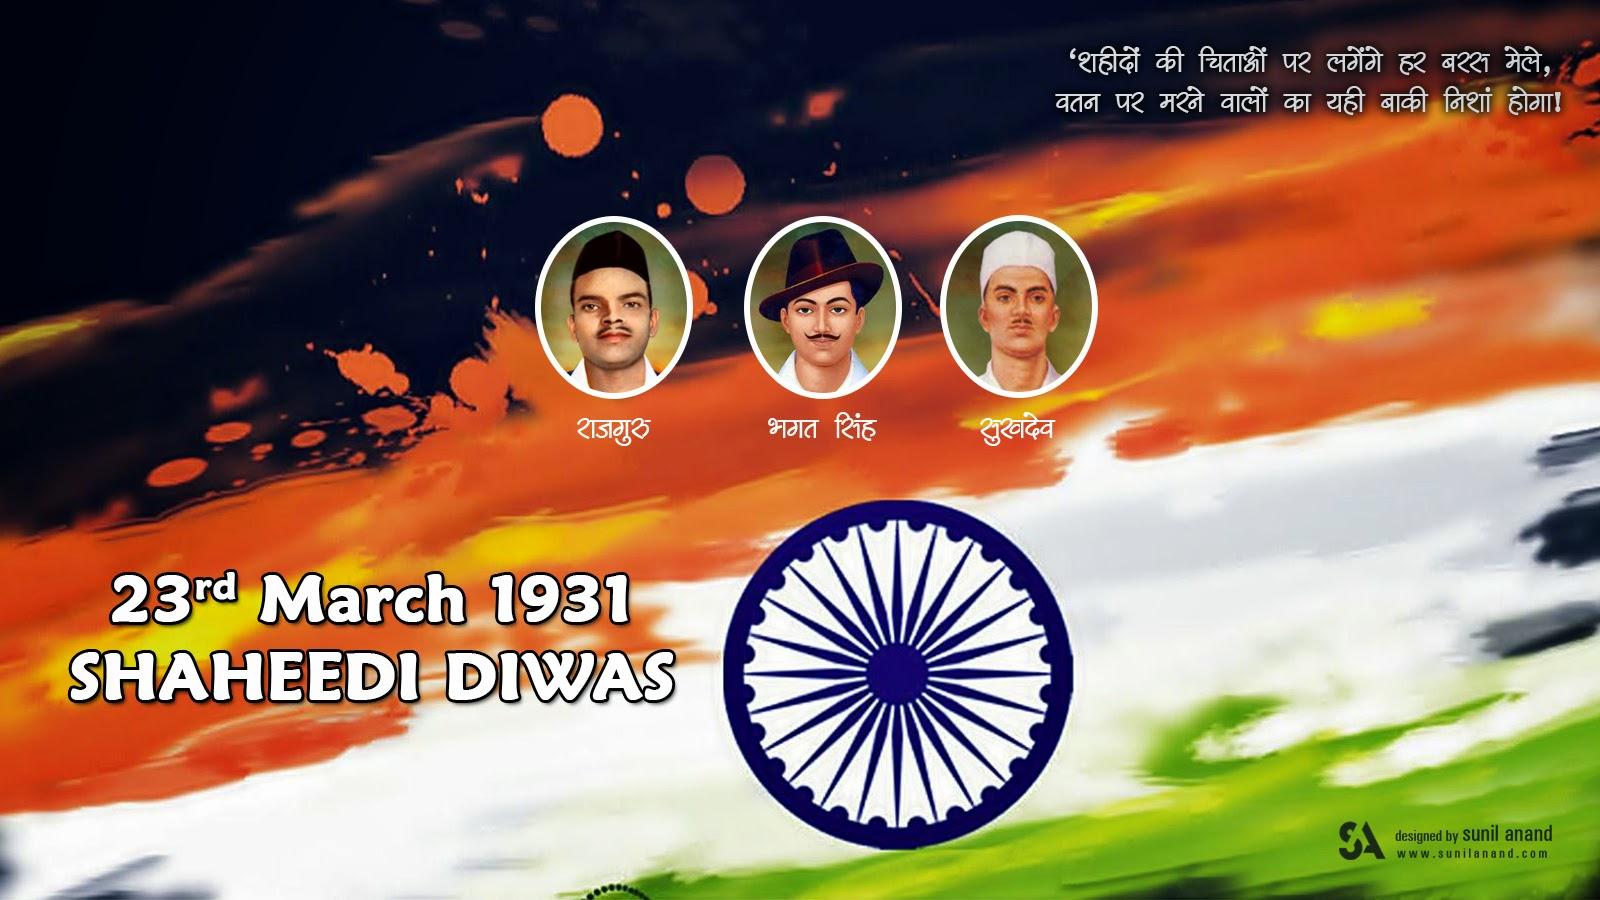 Ek Diwane Ki Kahani Shaheed Diwas Wallpaper